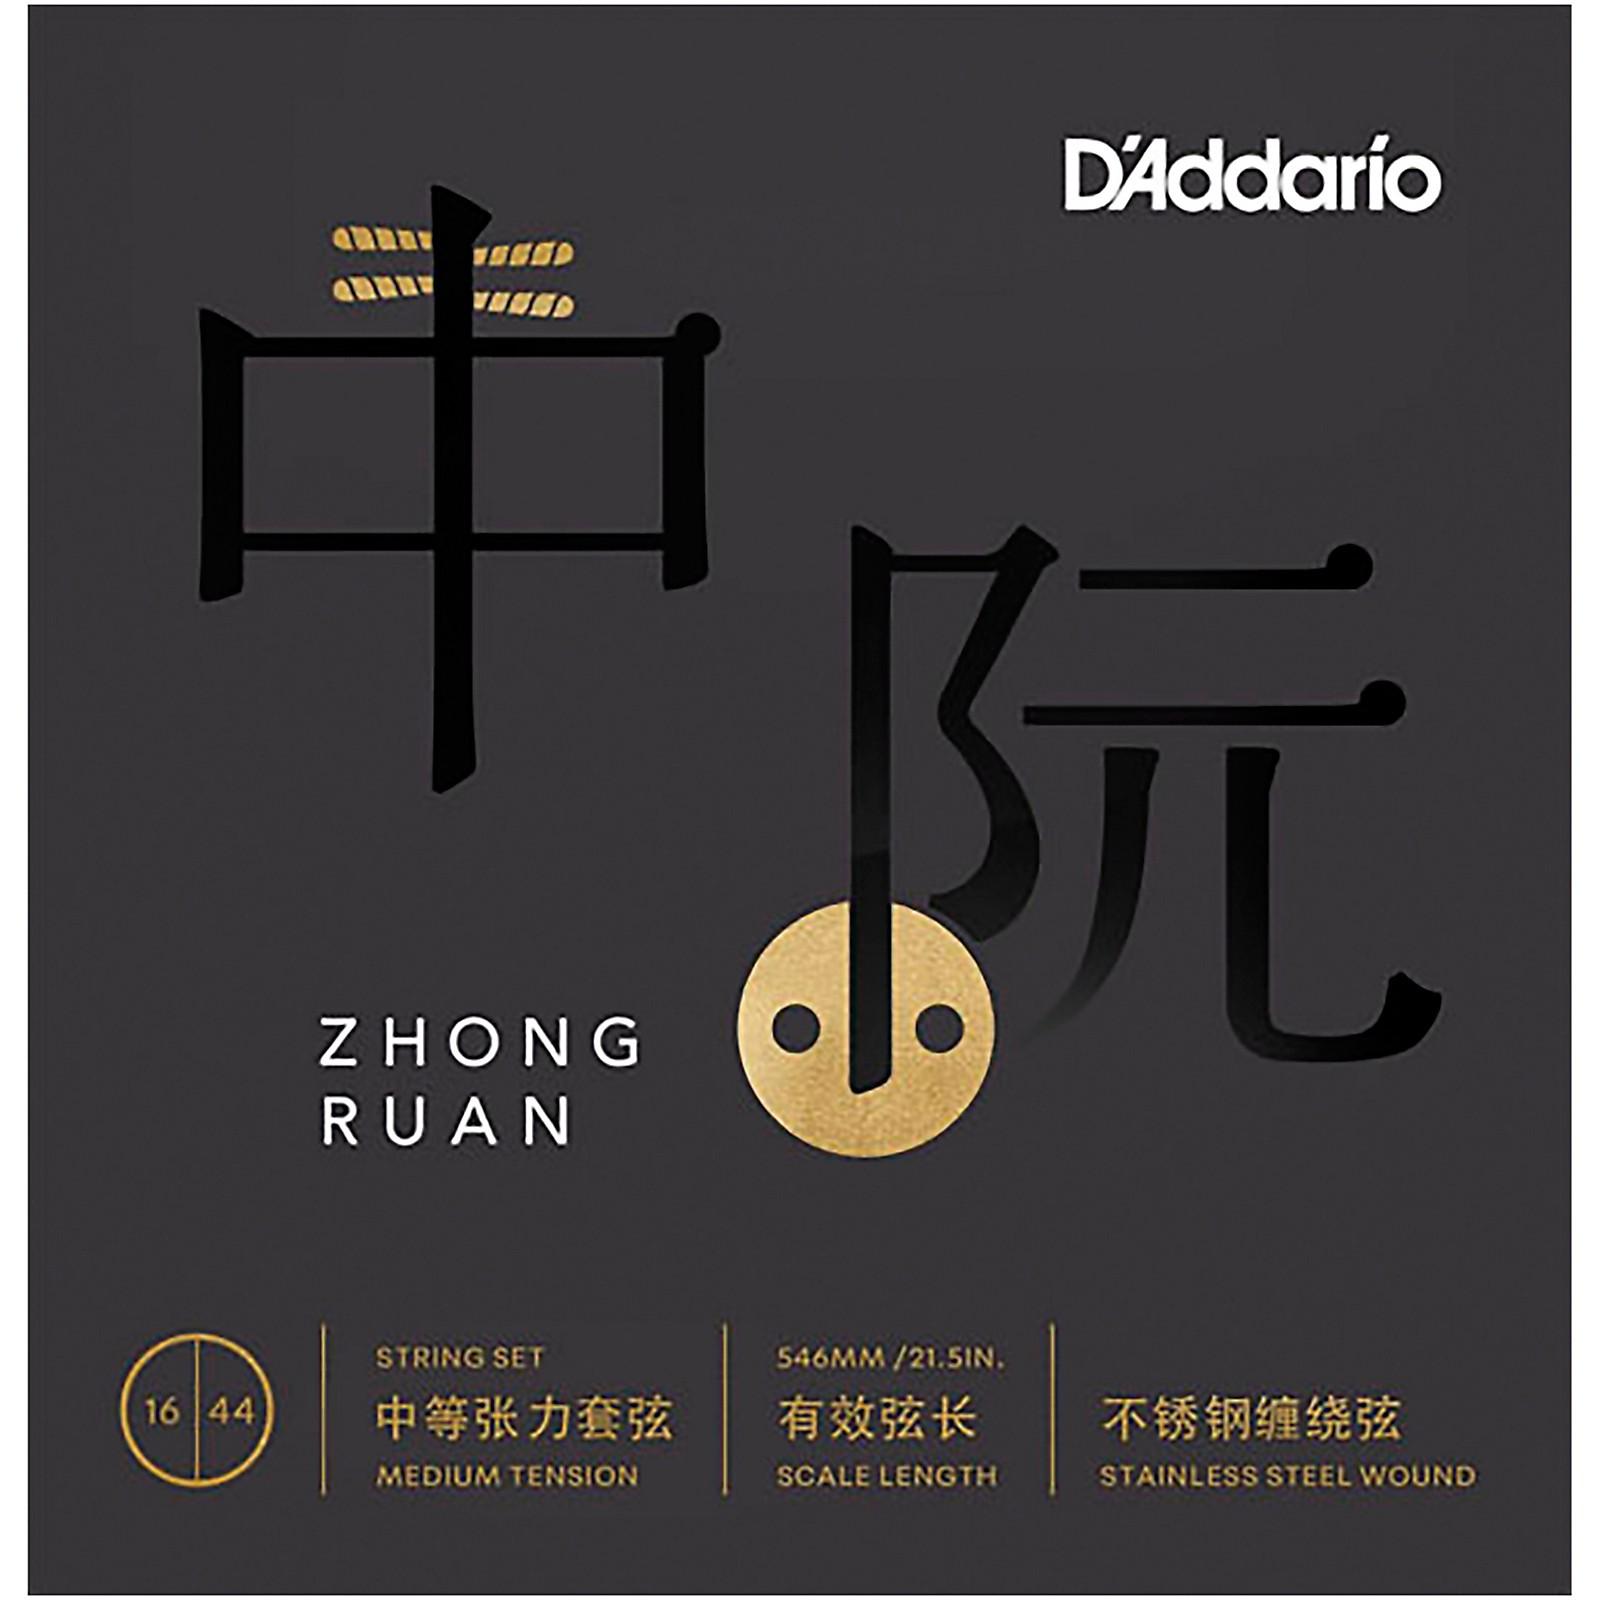 D'Addario Zhongruan Strings, Medium Tension, 16-44